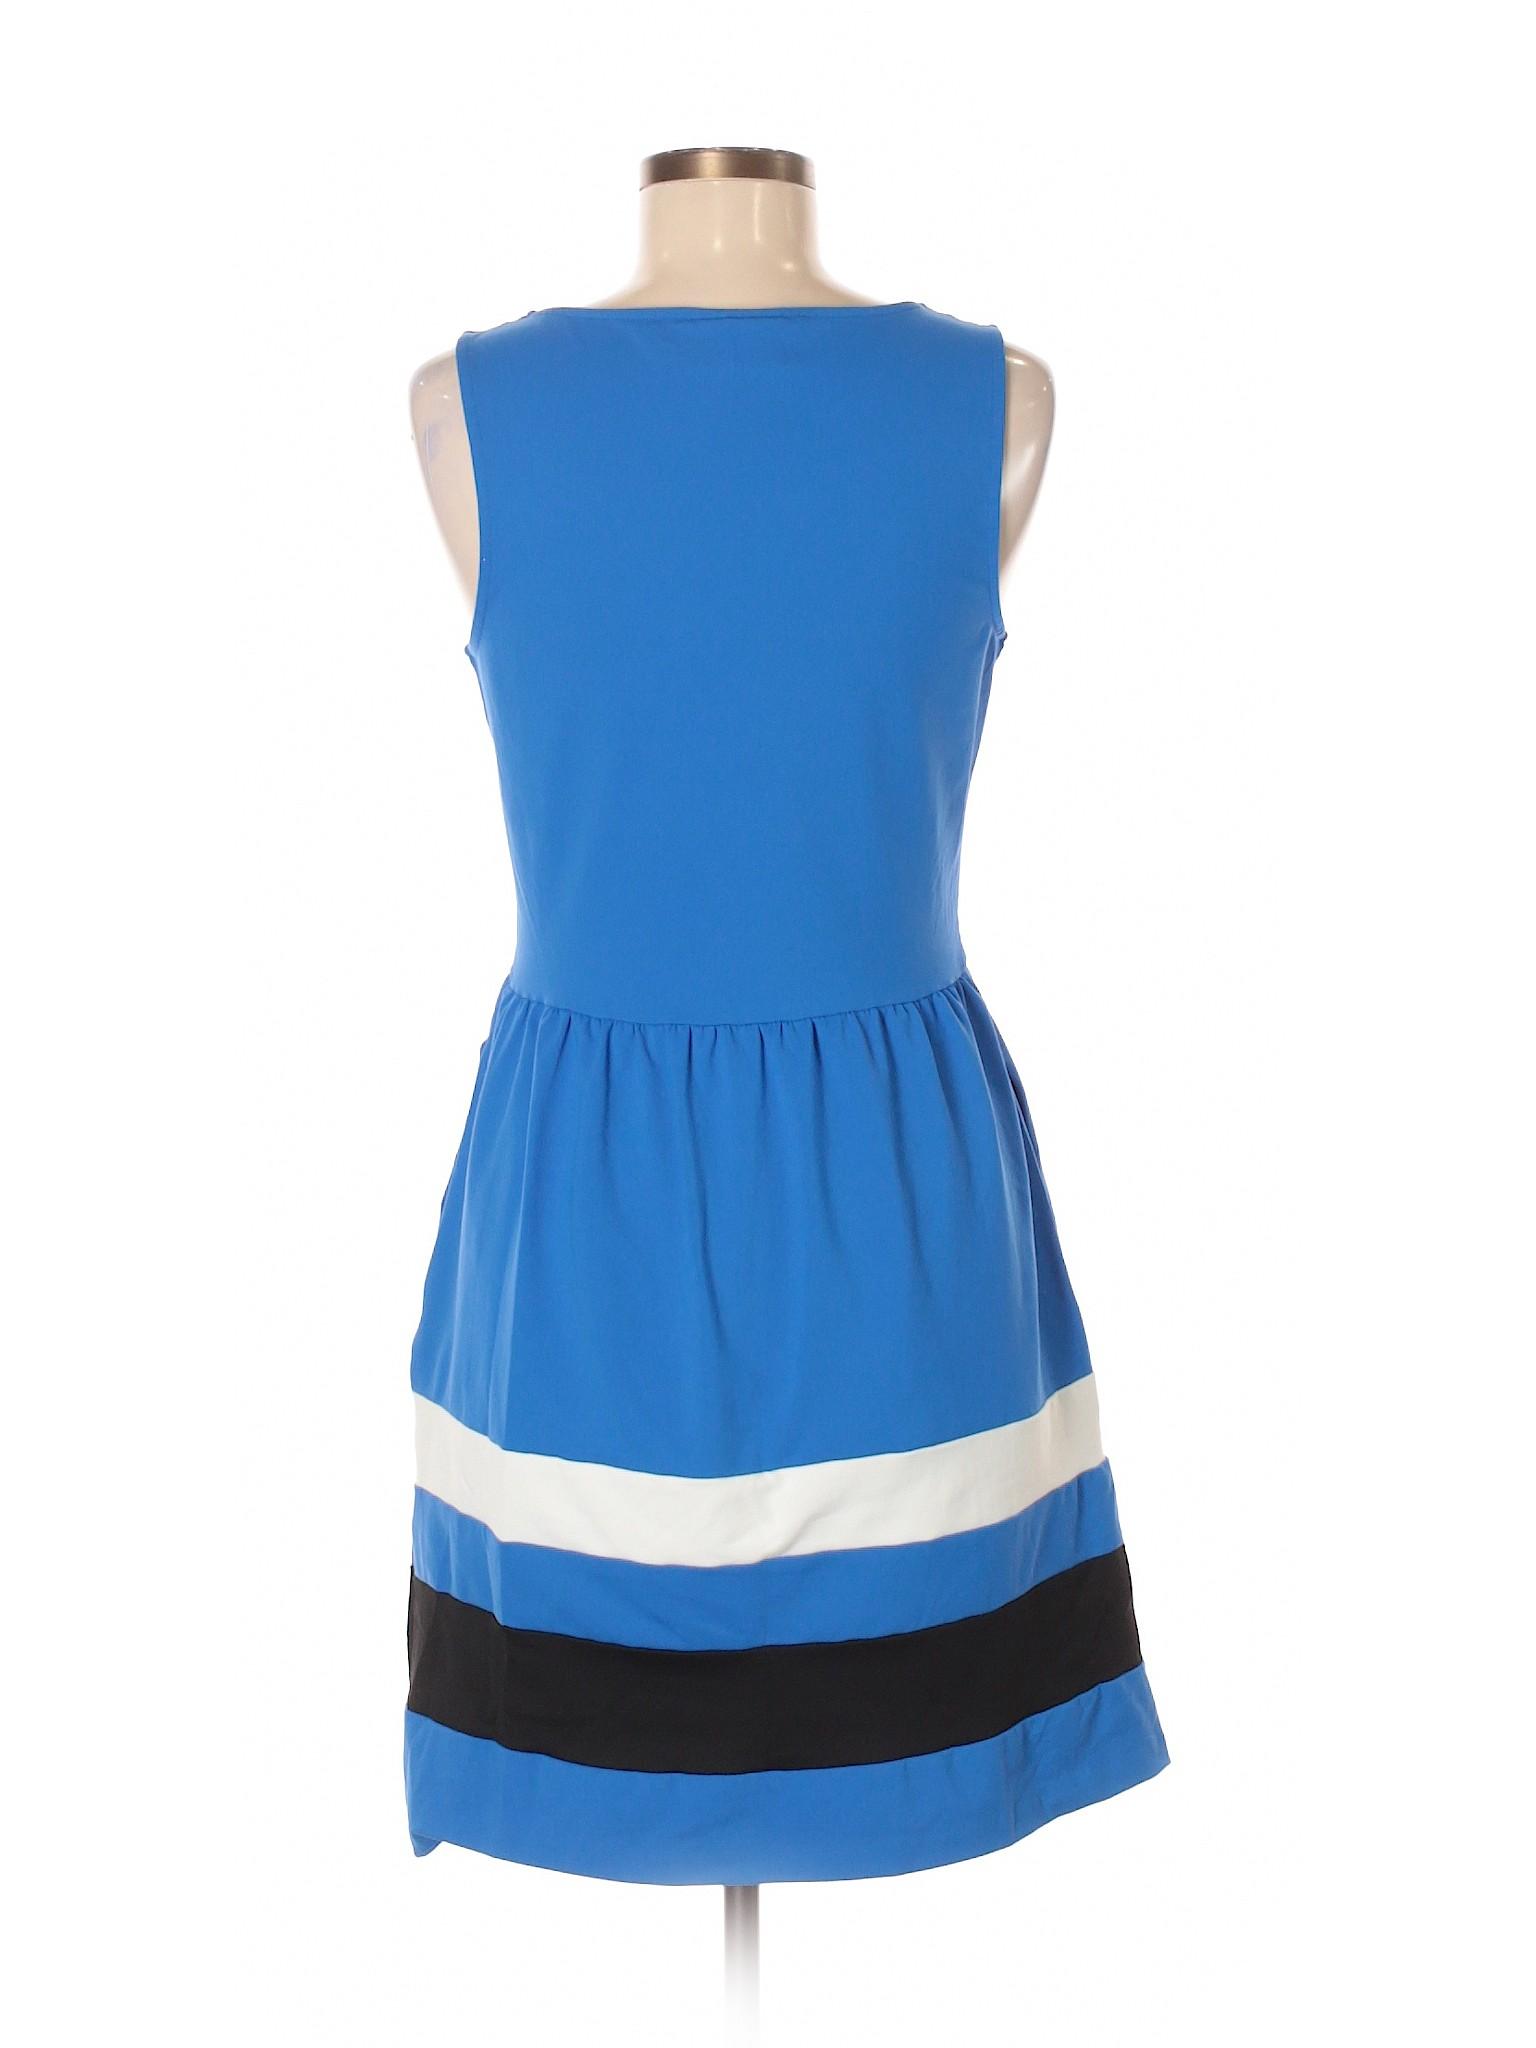 Dress winter TJX Boutique Casual Cynthia Rowley TaF11qX